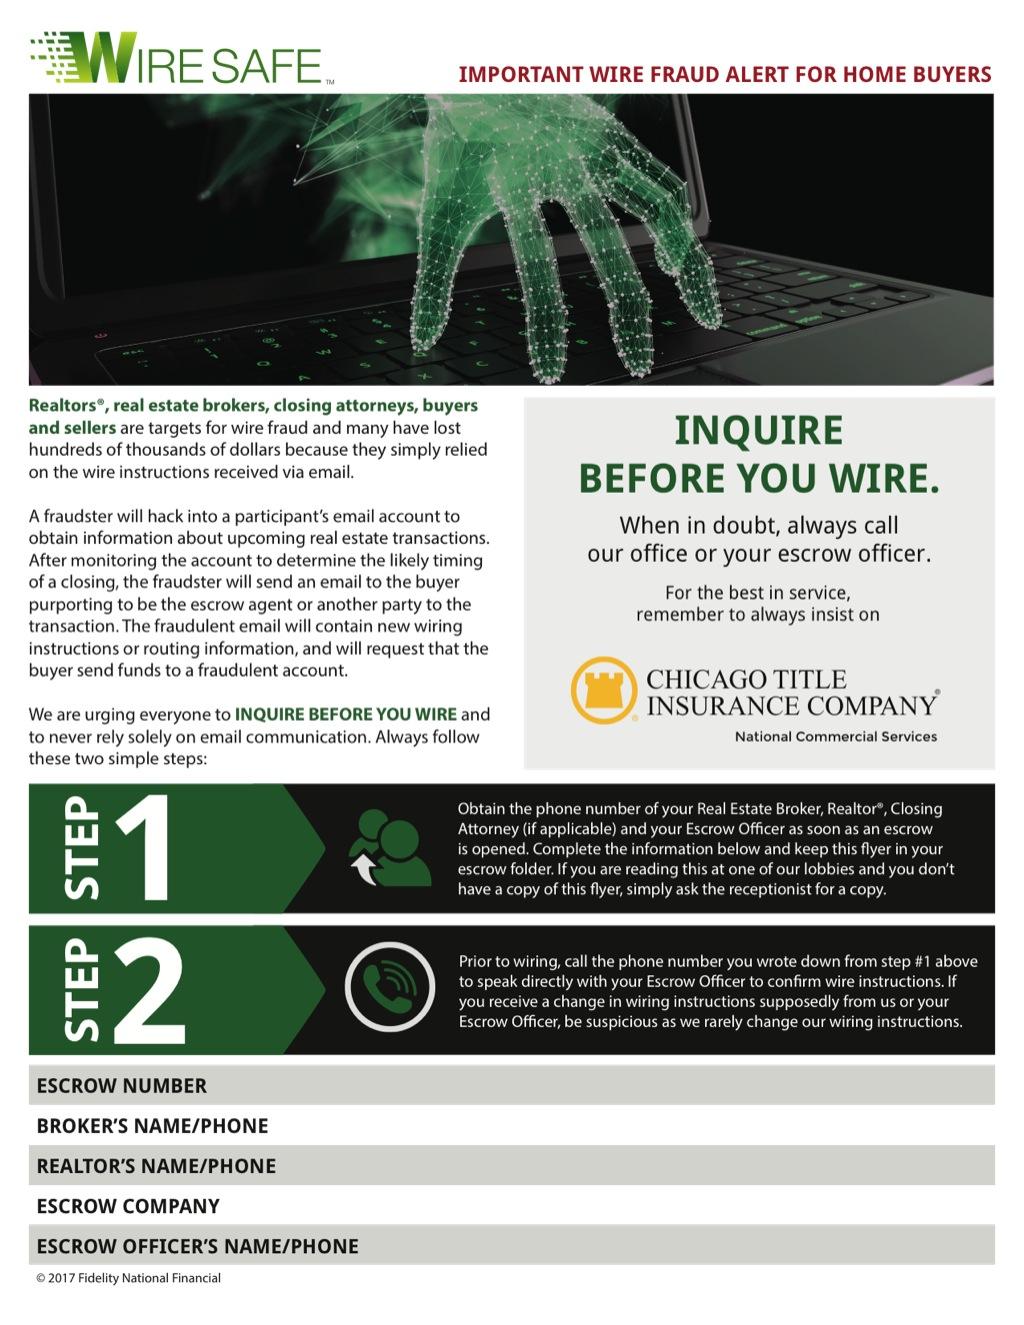 Corefact Wire Safe Buyer Flyer - CTIC NCS